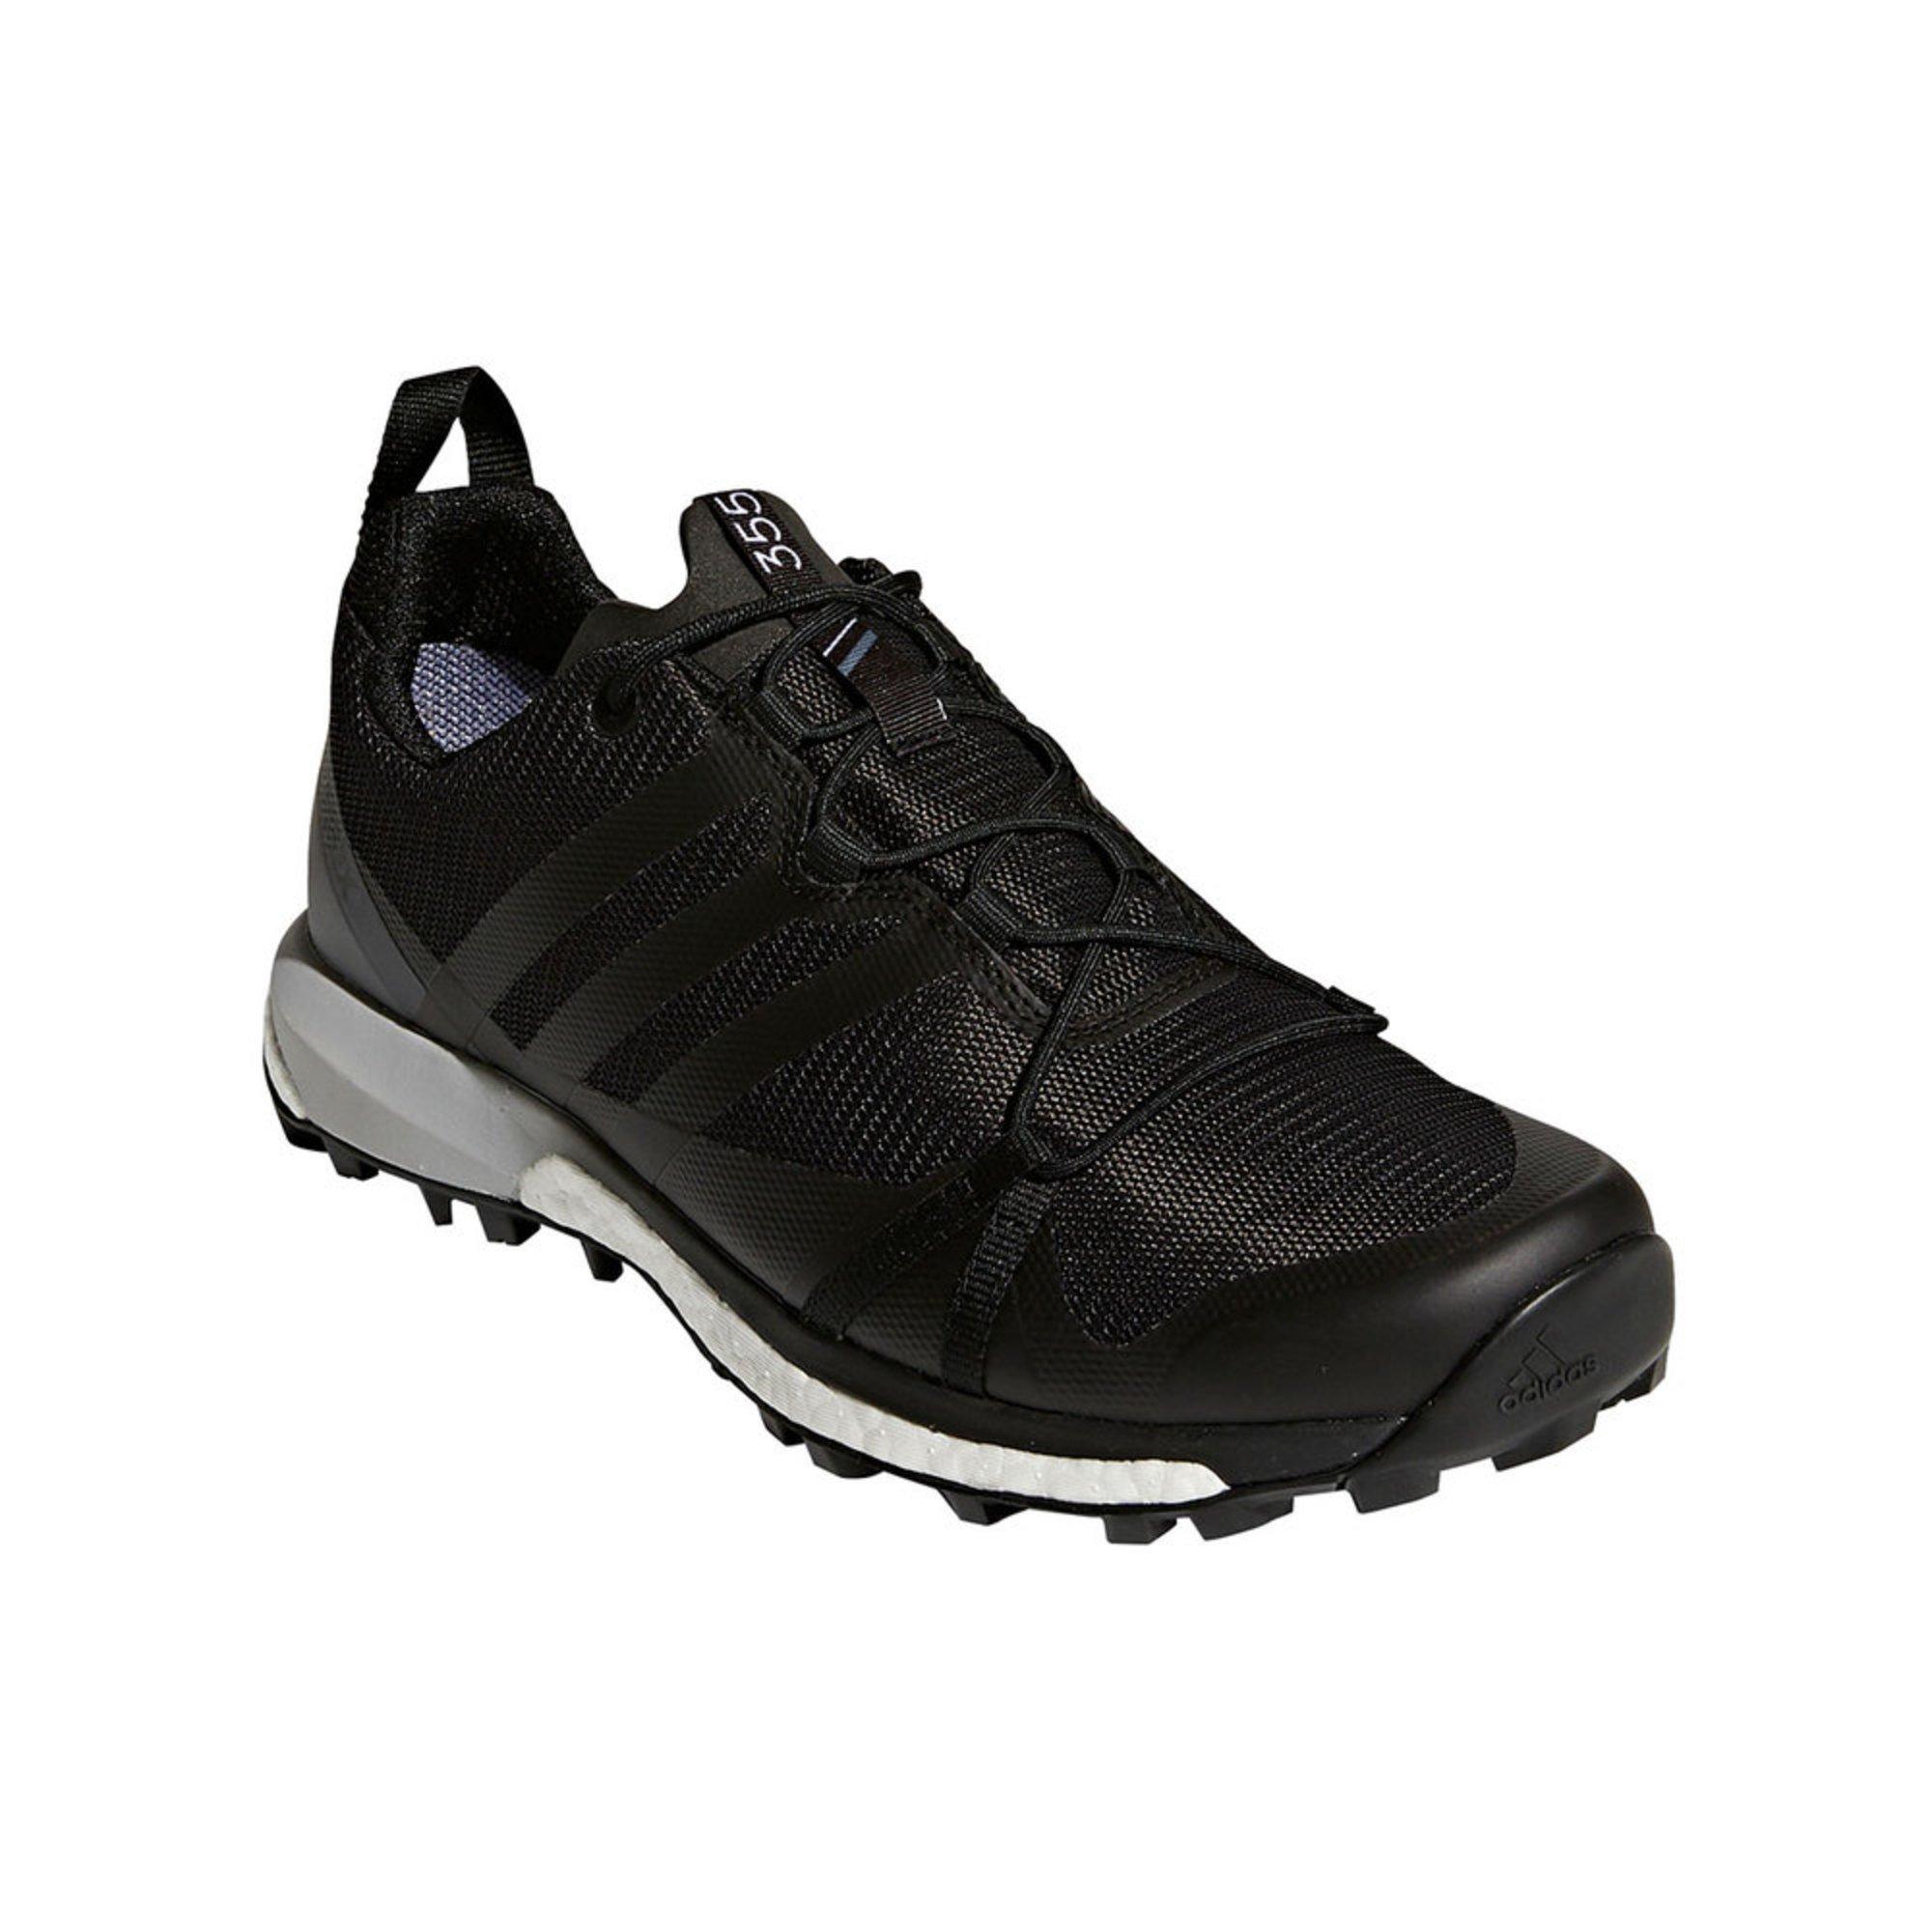 2589f25873fe Adidas Men s Outdoor Terrex Agravic Gtx Trail Running Shoe